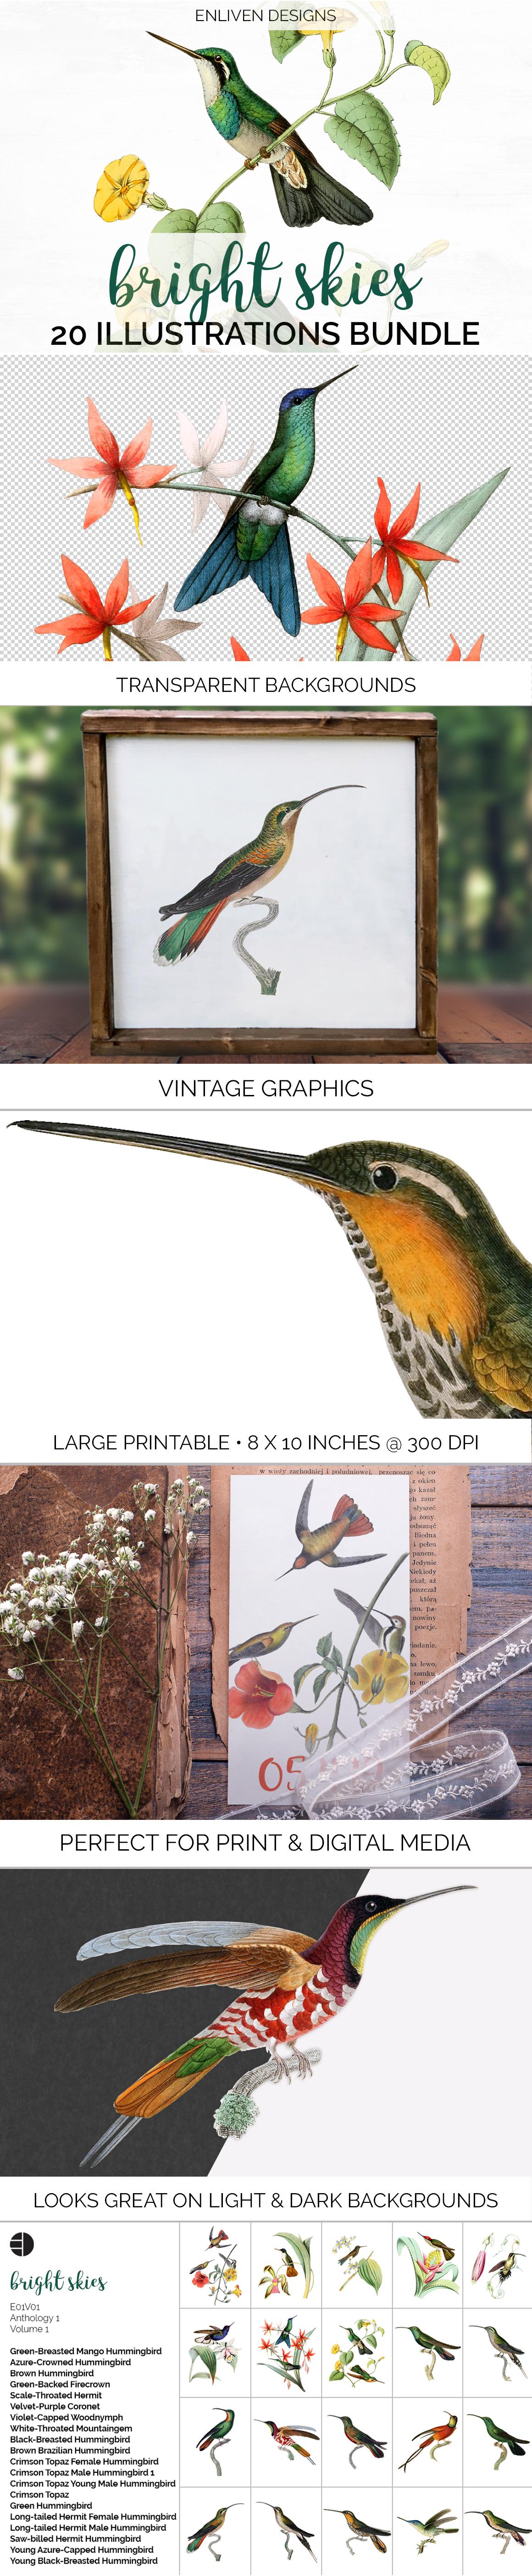 Hummingbird Bundle - Volume One - 20 Count - Humming Birds example image 5